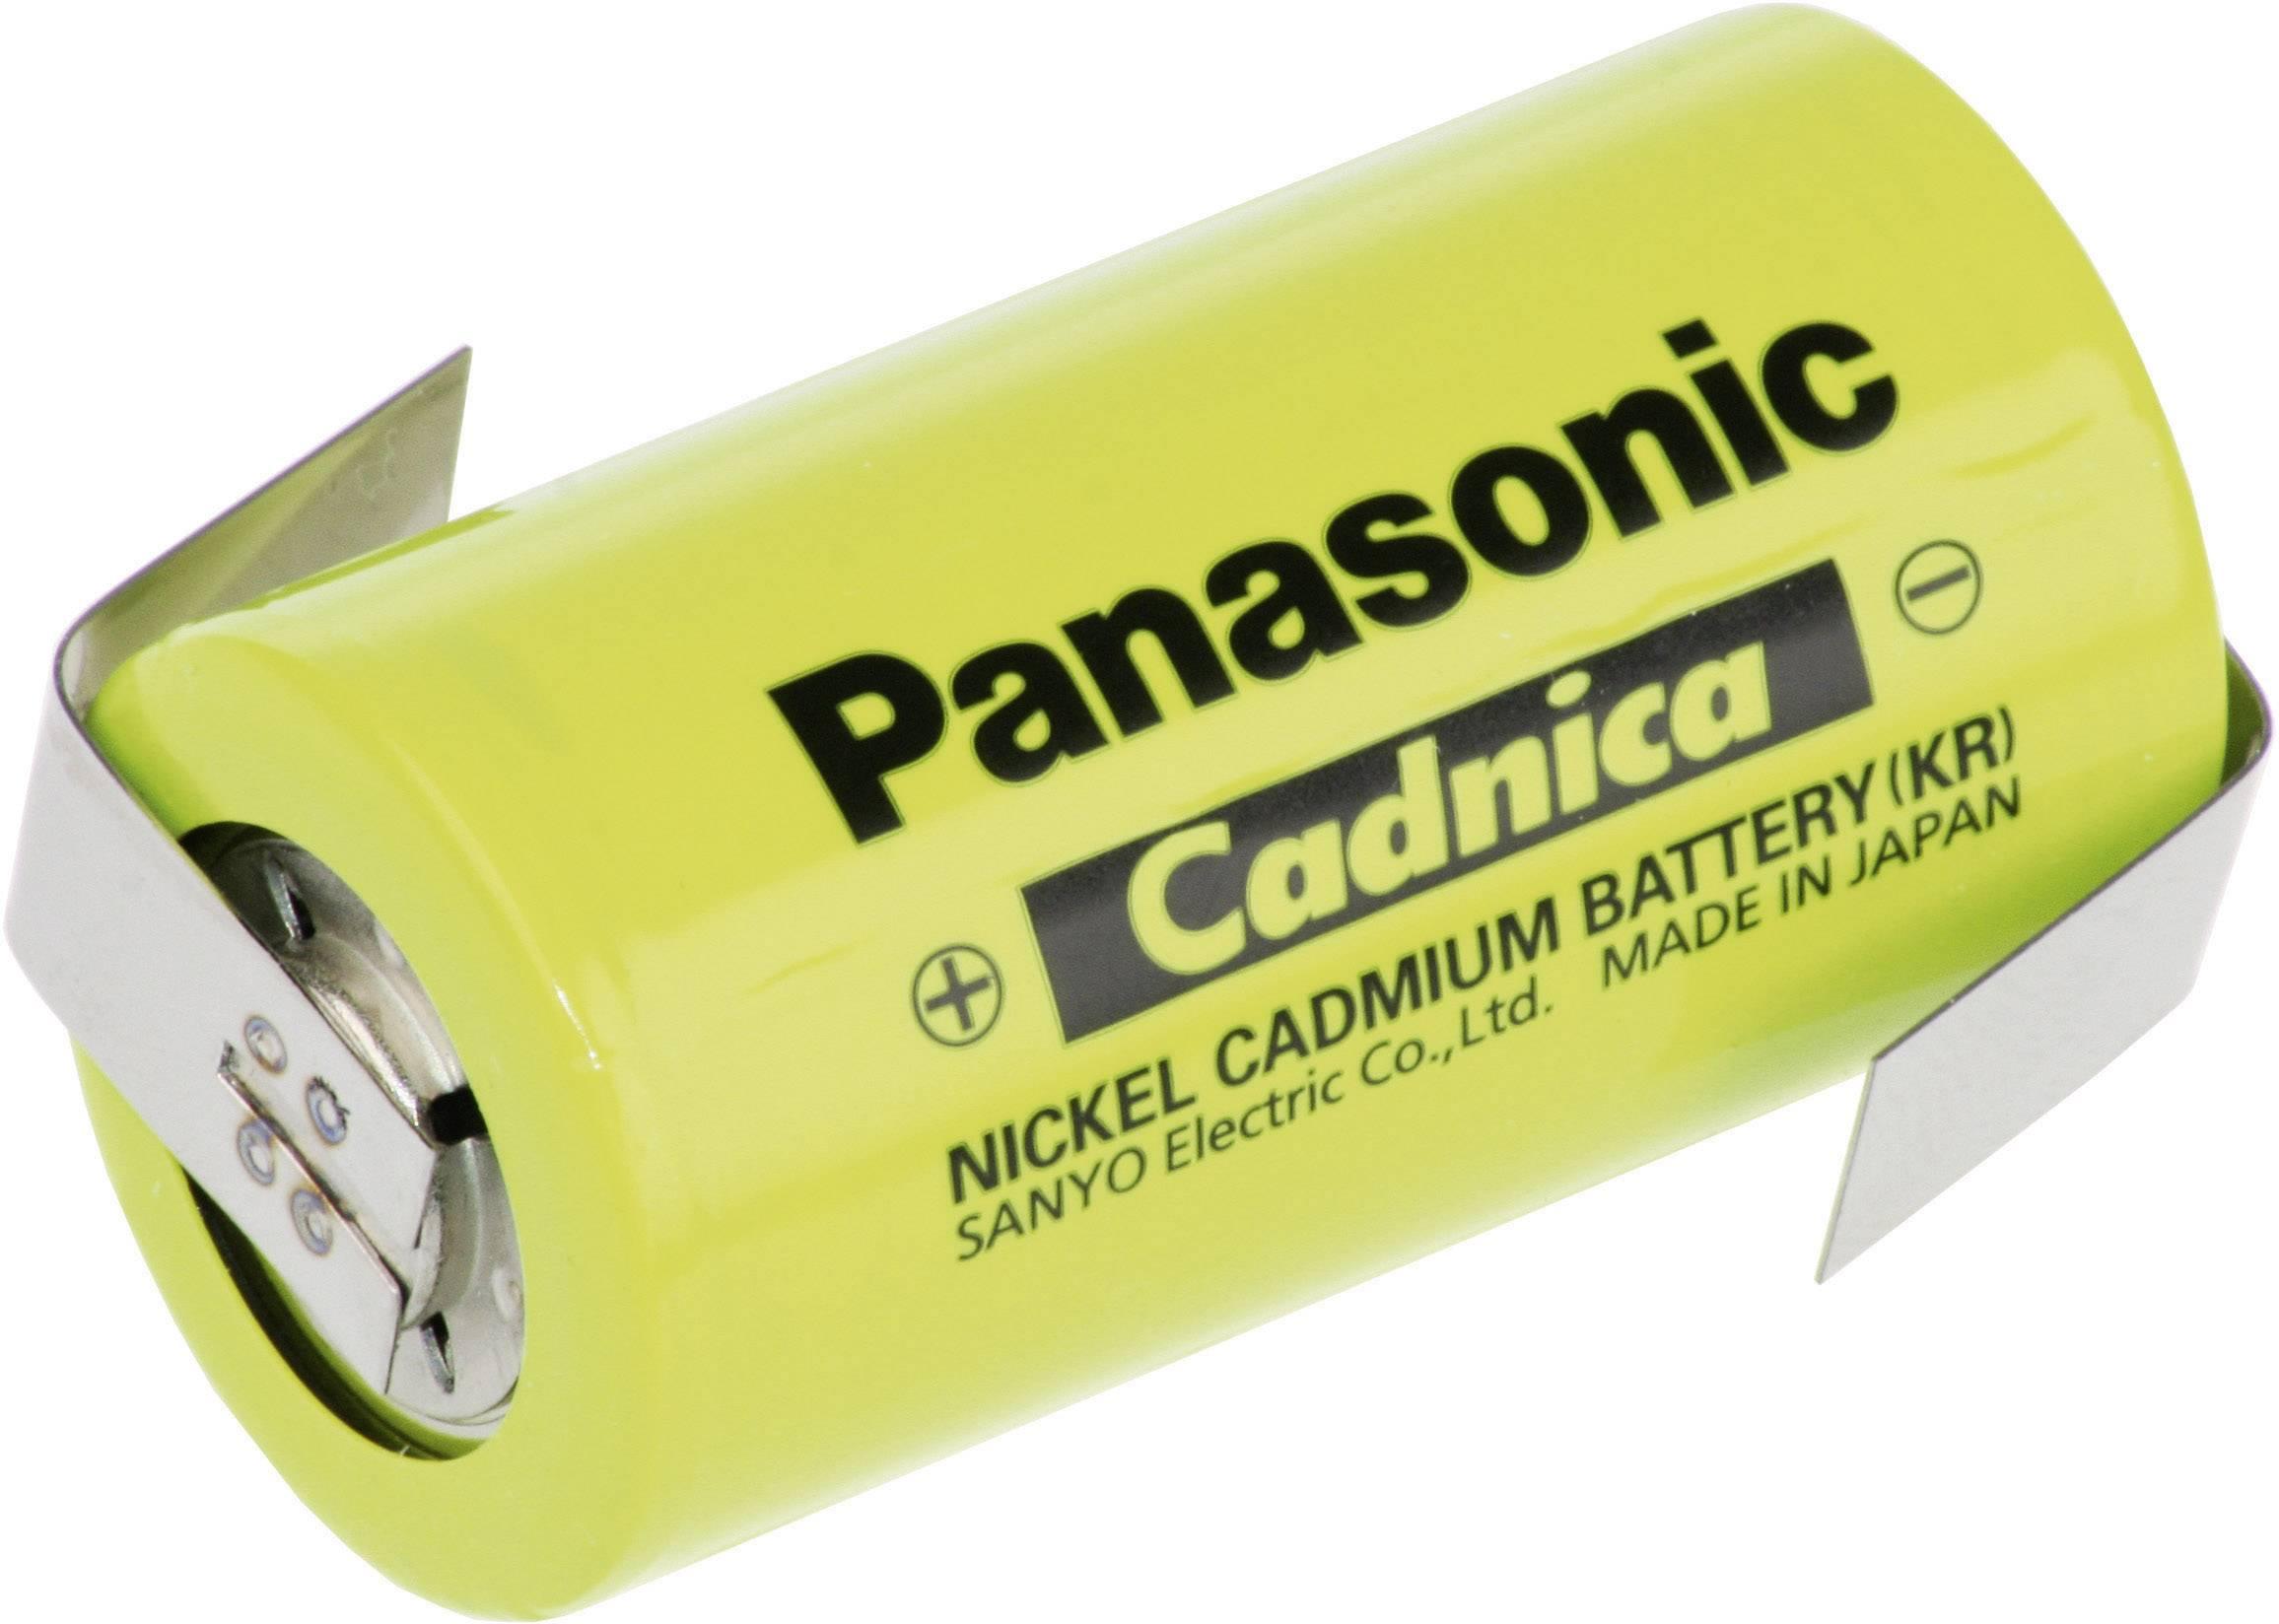 Špeciálny akumulátor Panasonic C ZLF, baby (C), NiCd, 1.2 V, 3000 mAh